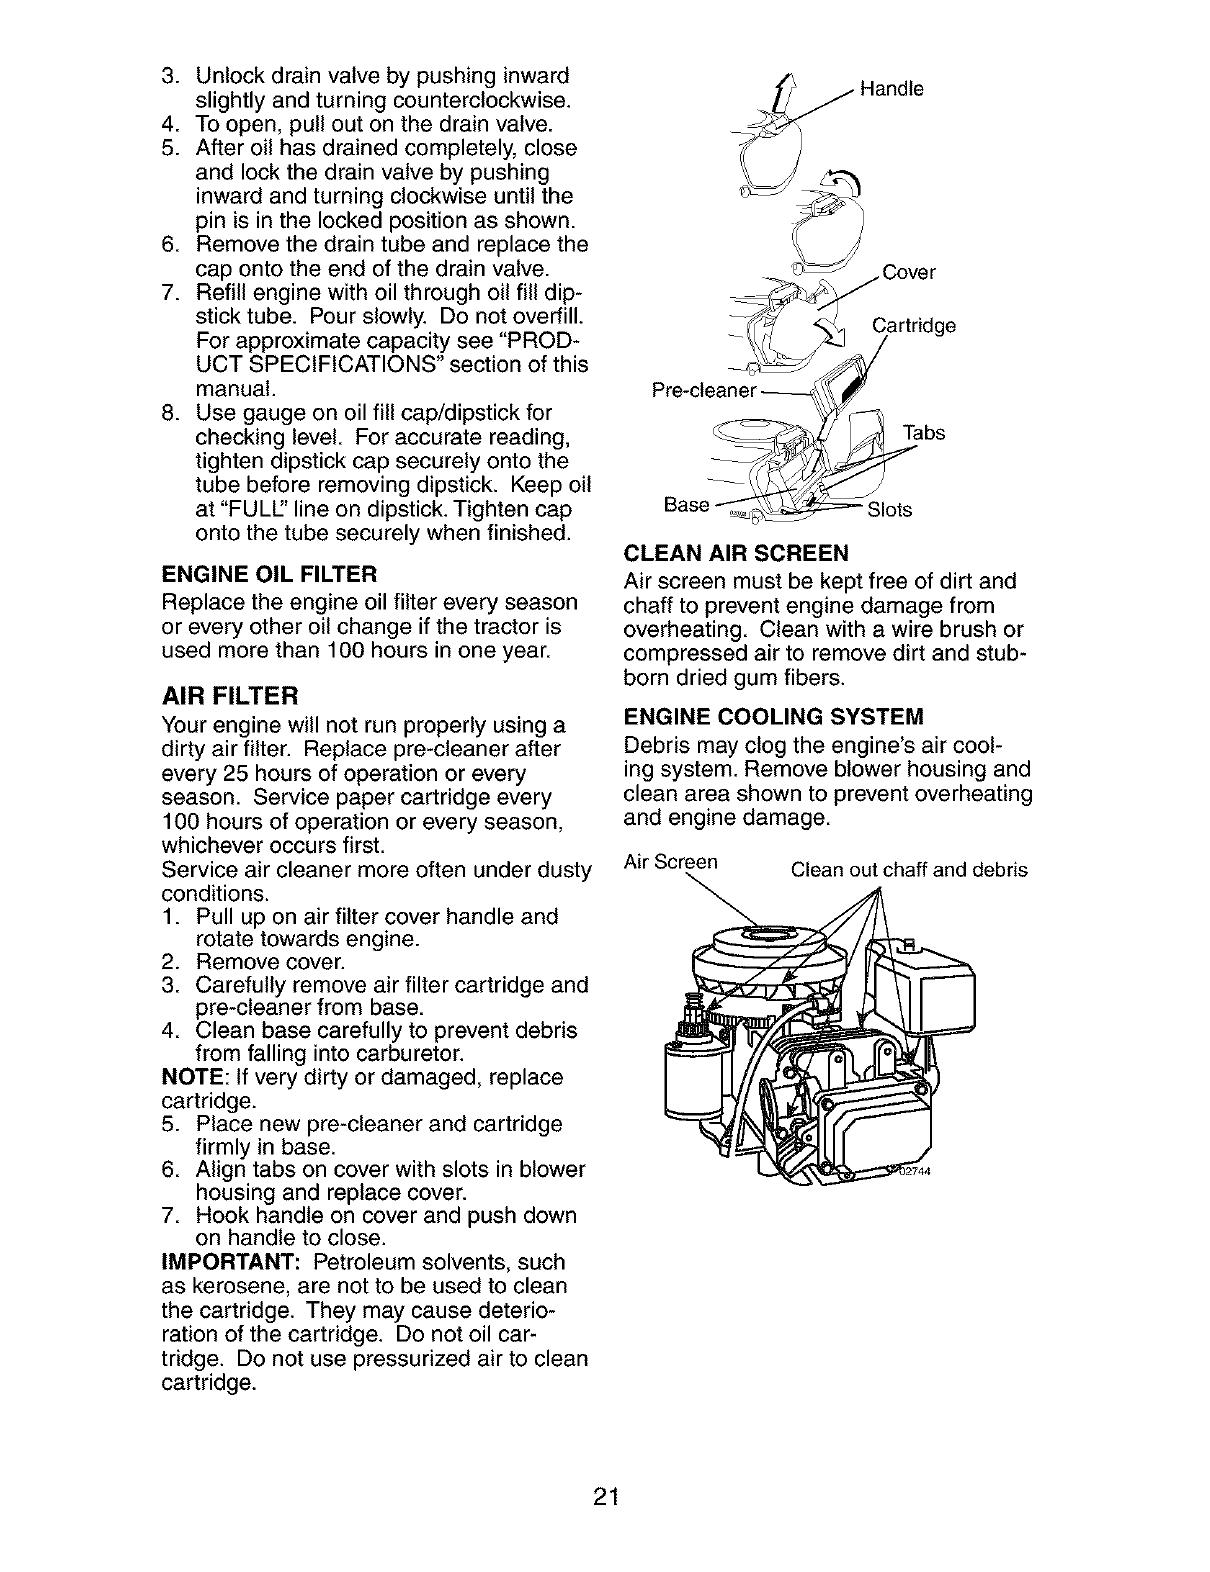 Craftsman 917273761 User Manual Lawn Tractor Manuals And Guides L0403297 Wiring Diagram 917 273761 3 Unlock Drain Valve By Pushing Inward